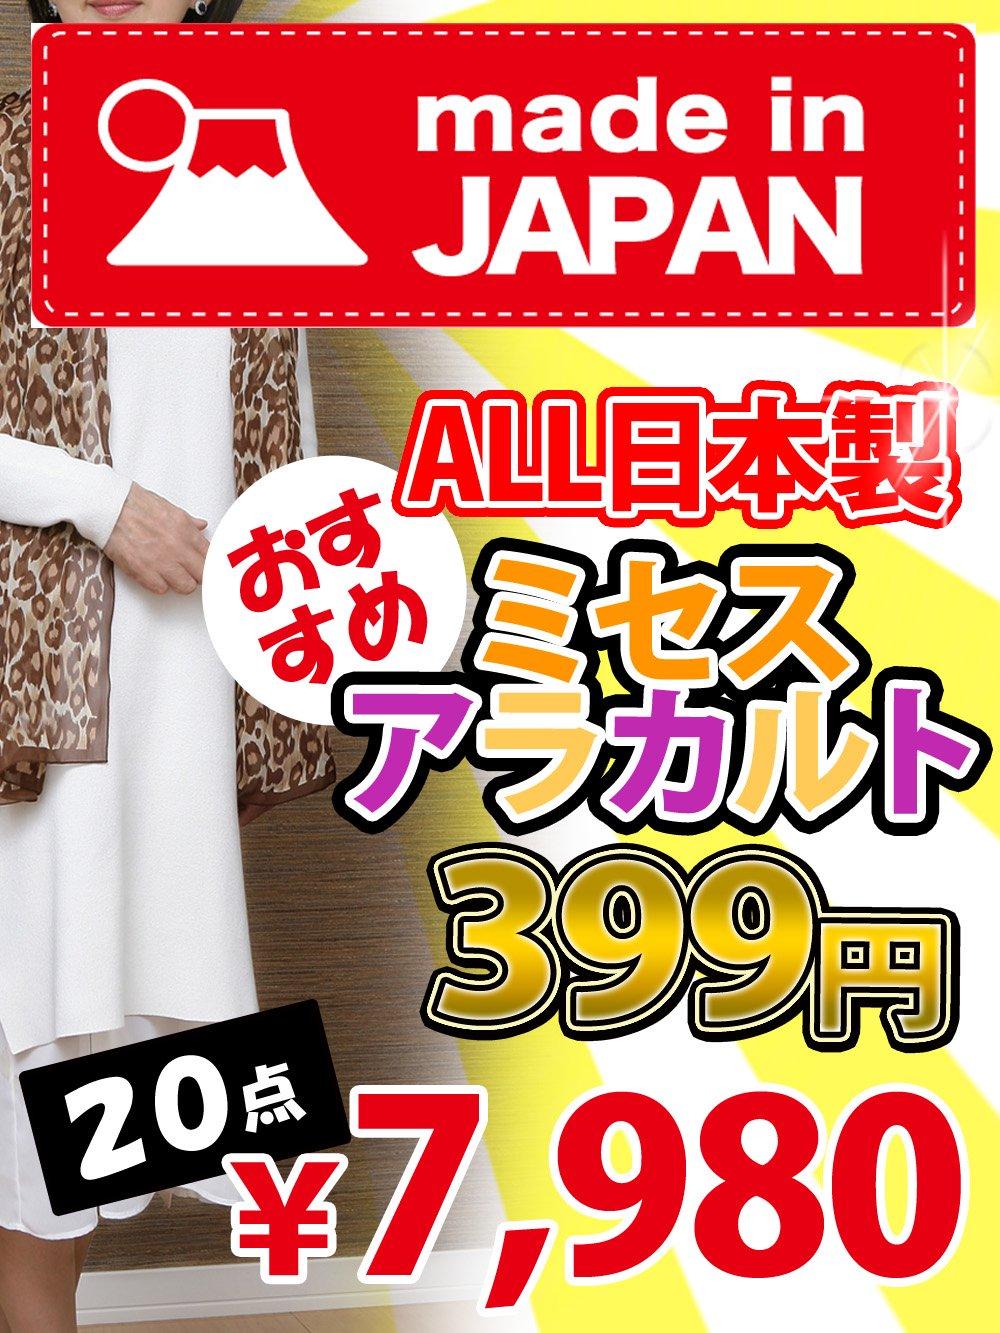 【ALL日本製】おすすめミセスアパレルアラカルト!20点@399